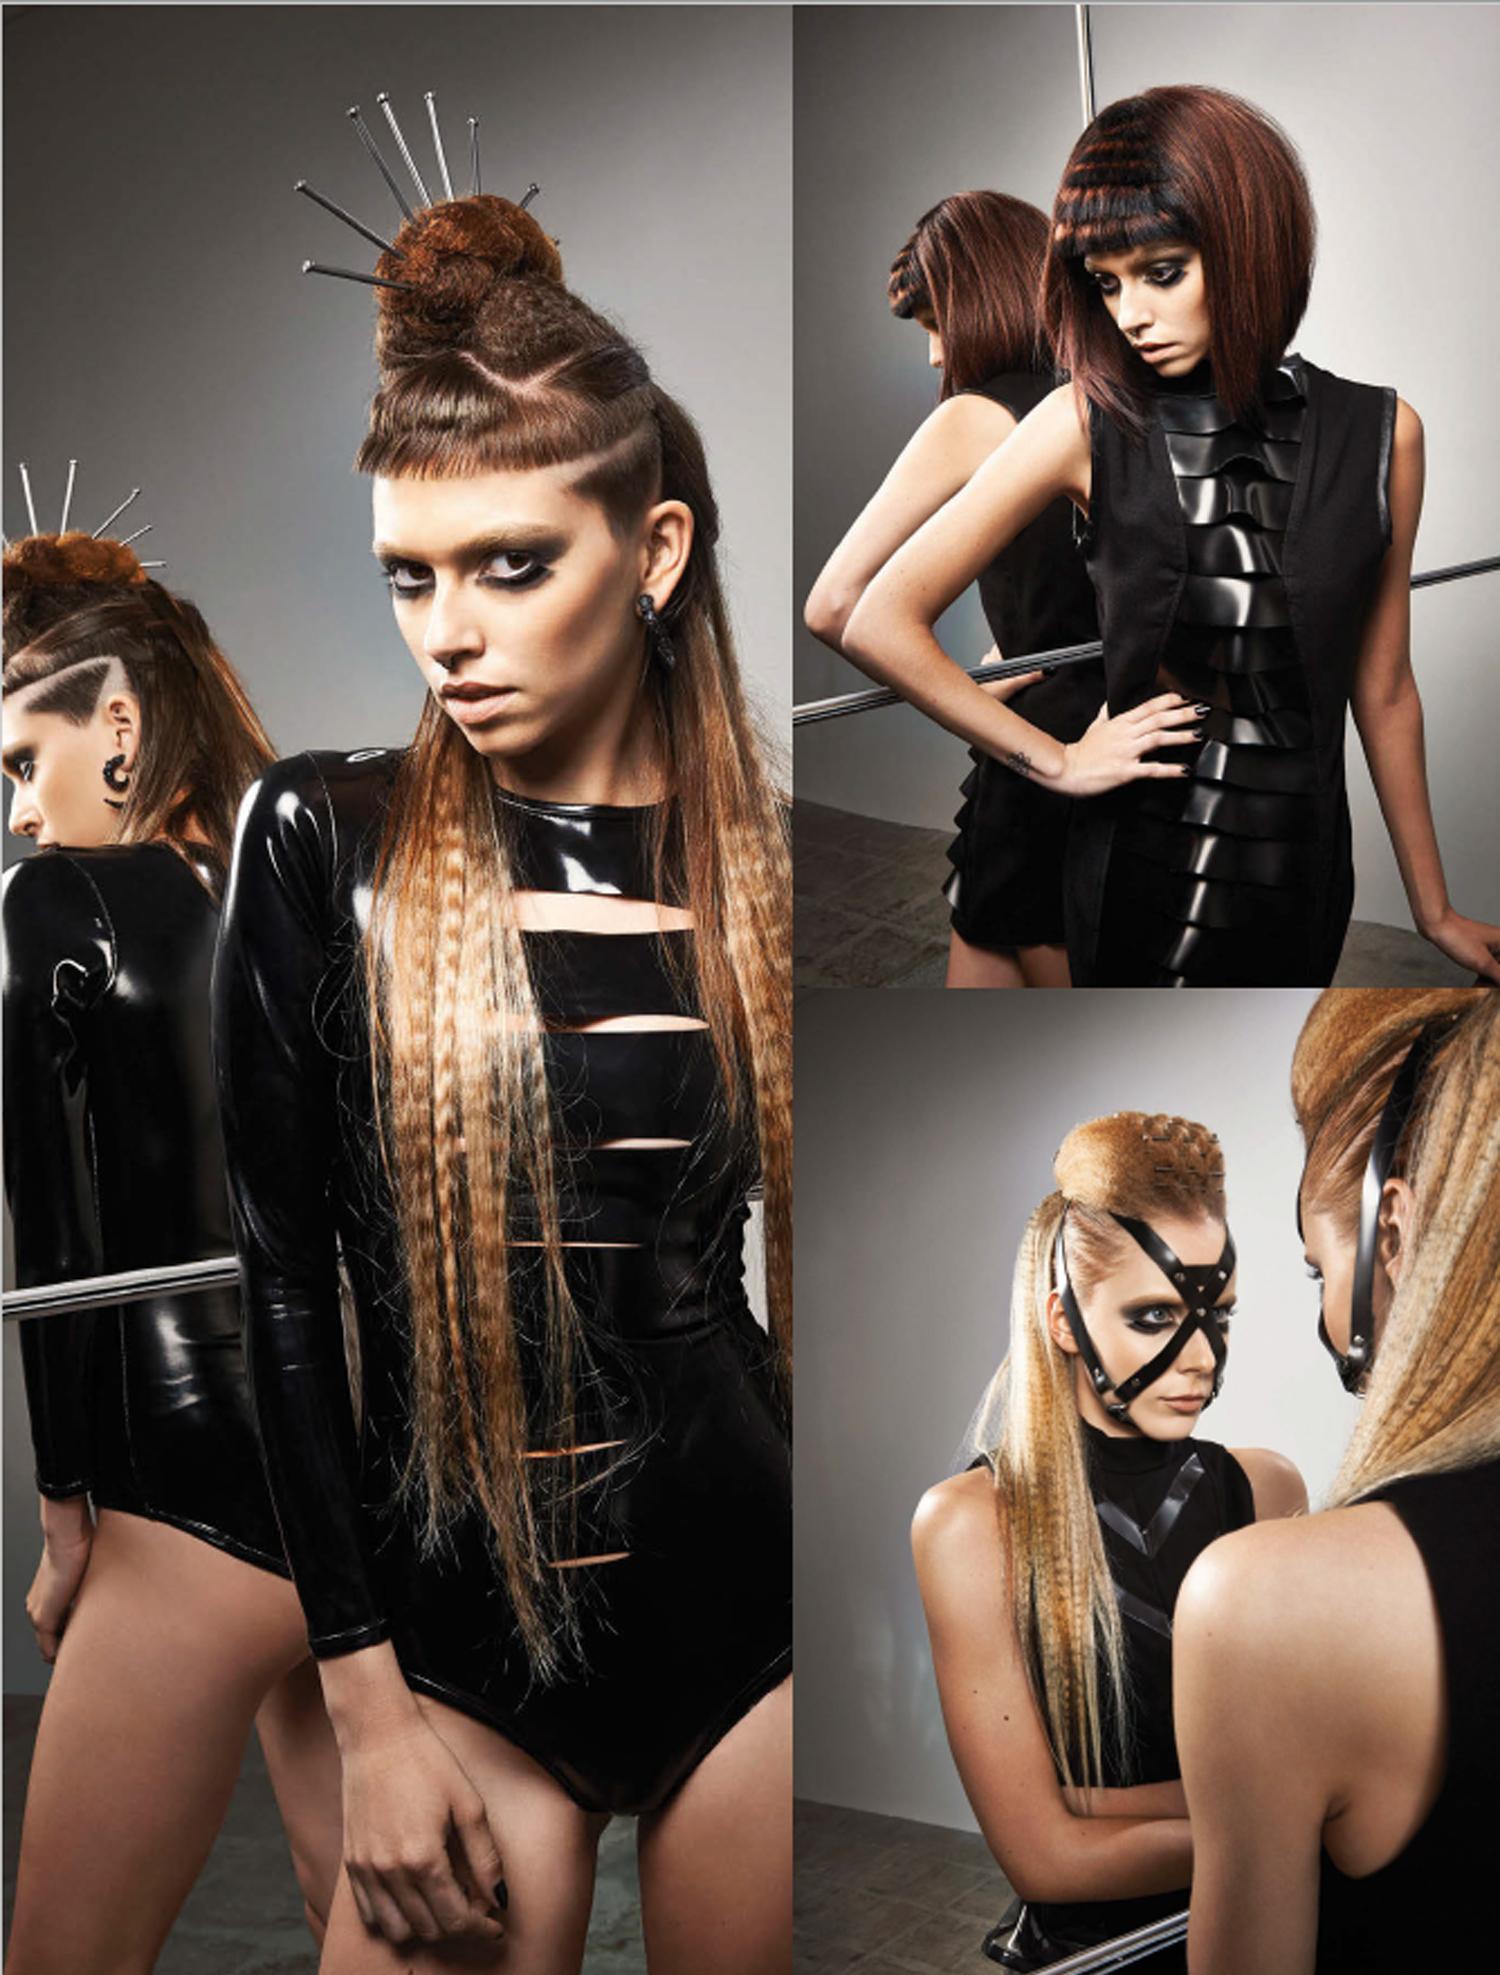 yoshikohair_stkilda_melbourne_hairdresser_hairsalon_hair&beauty17_3